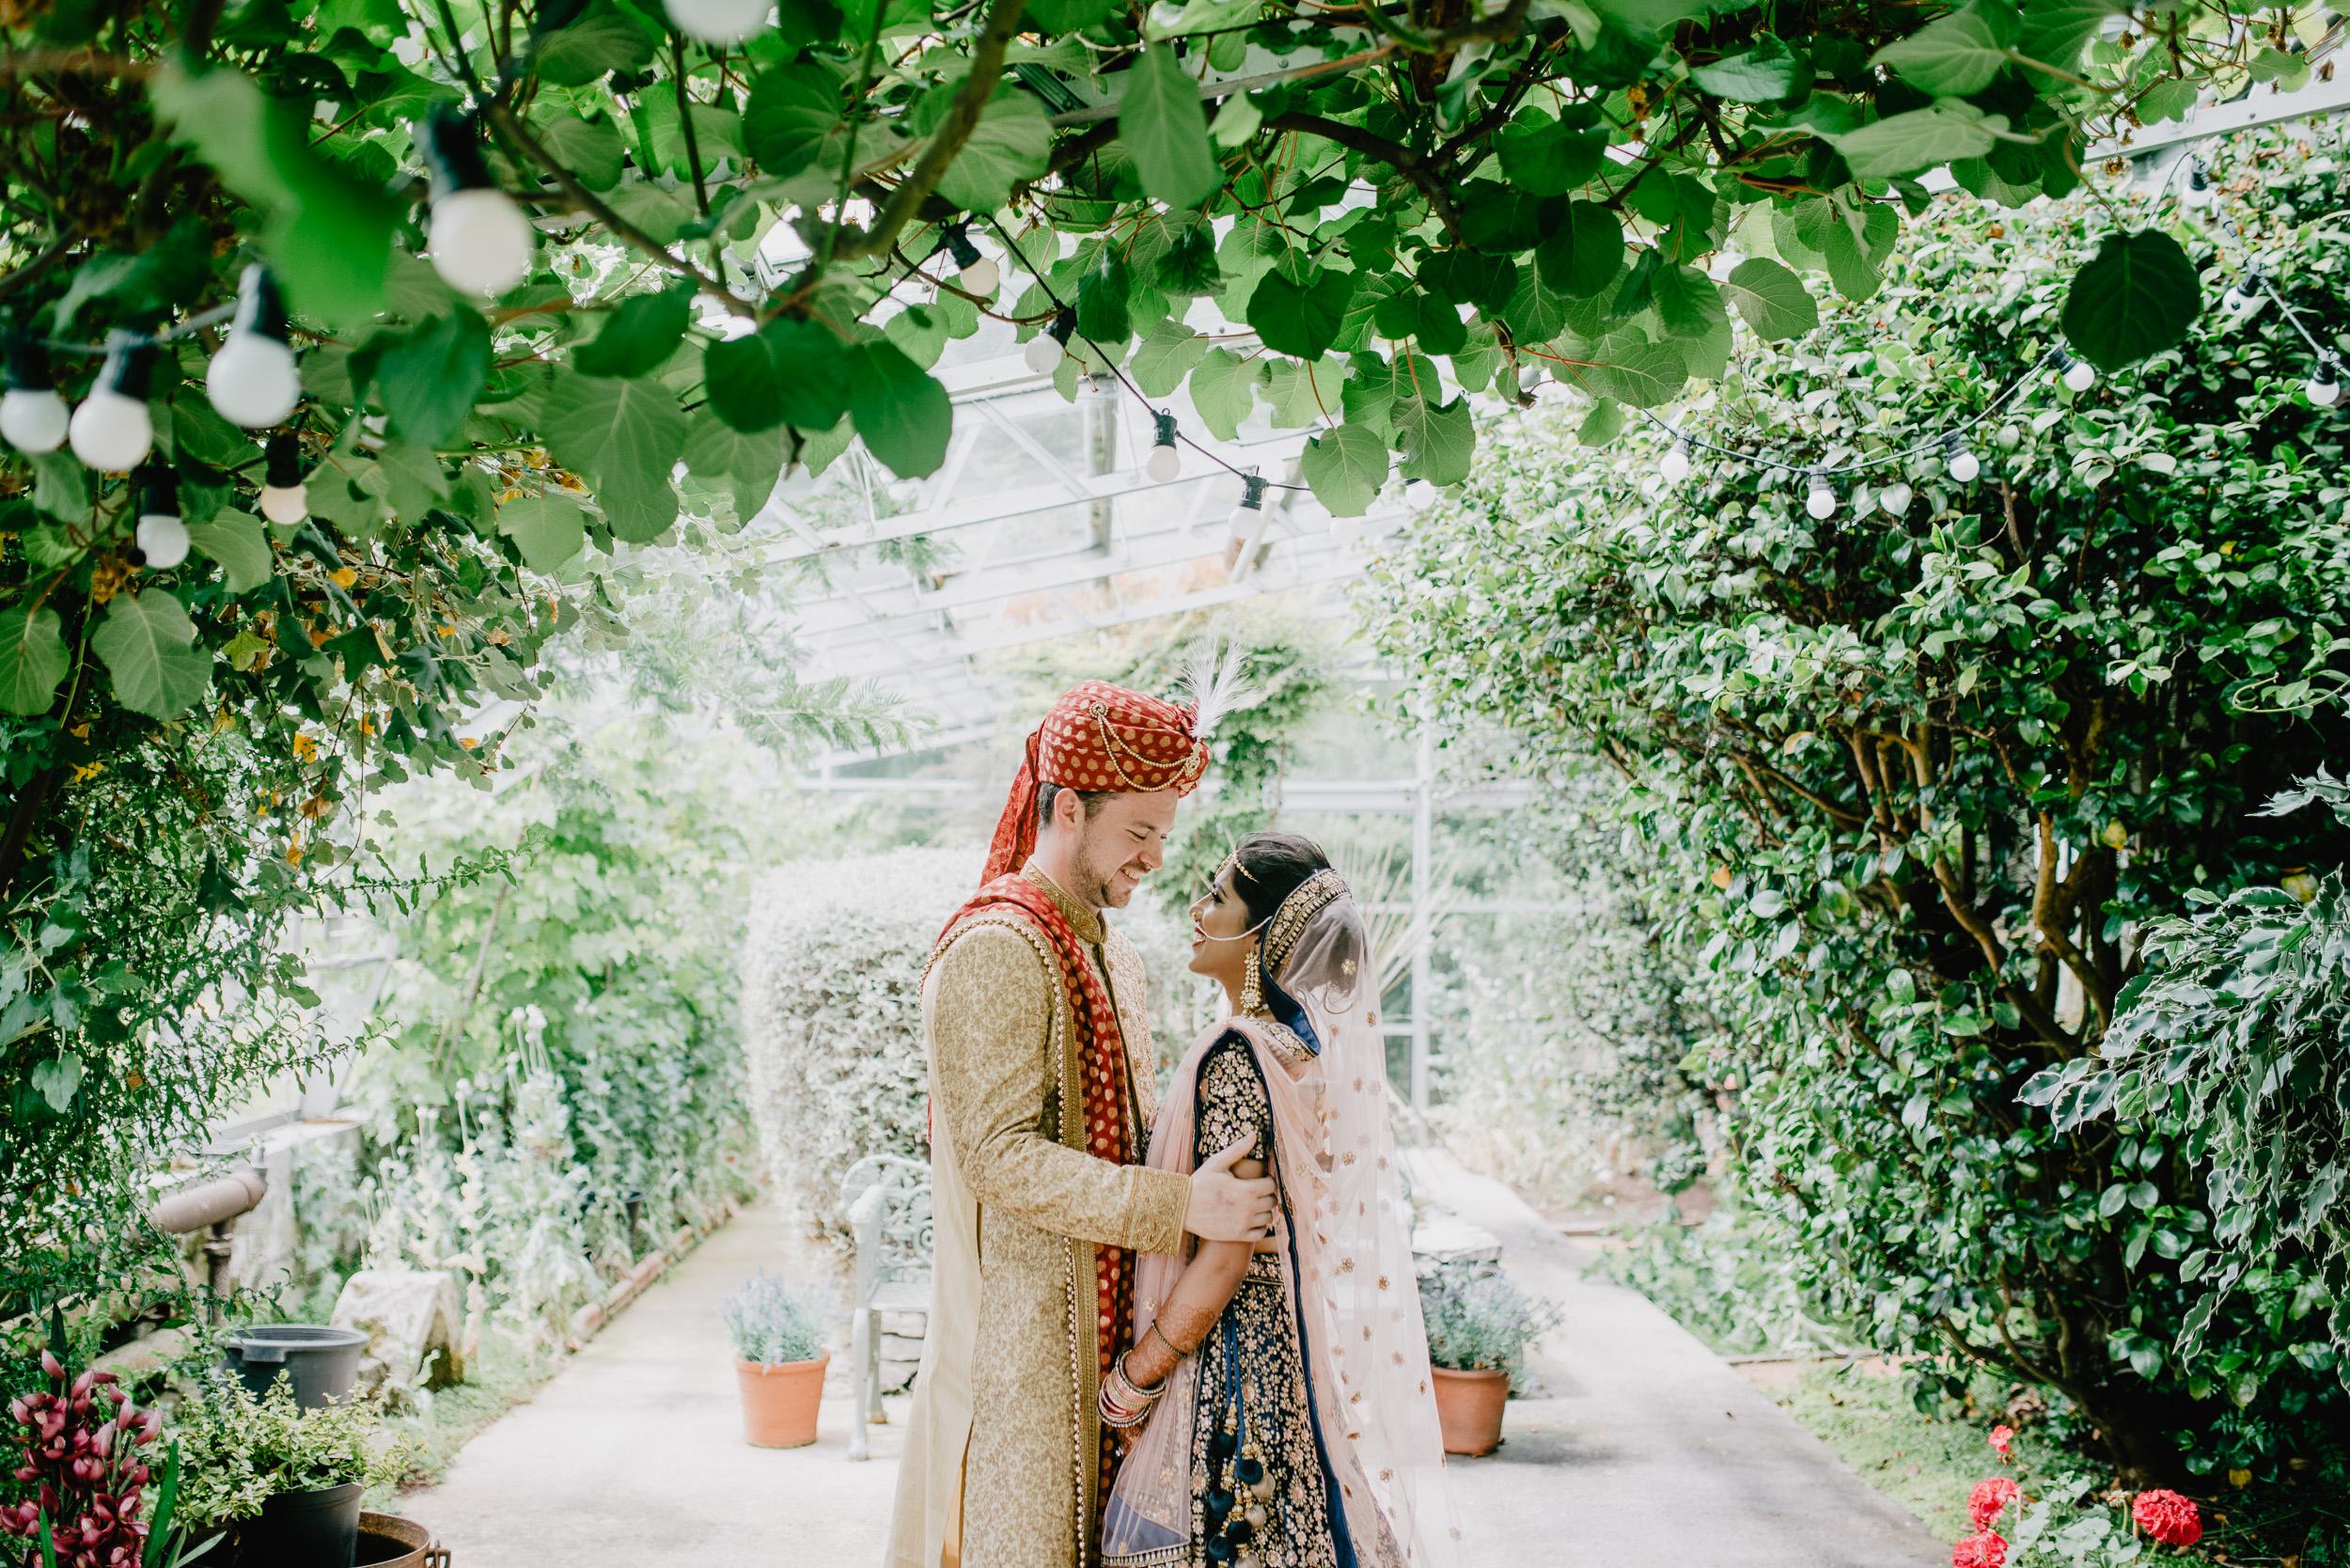 wedding photogaphy peter mackey 2018-4.jpg